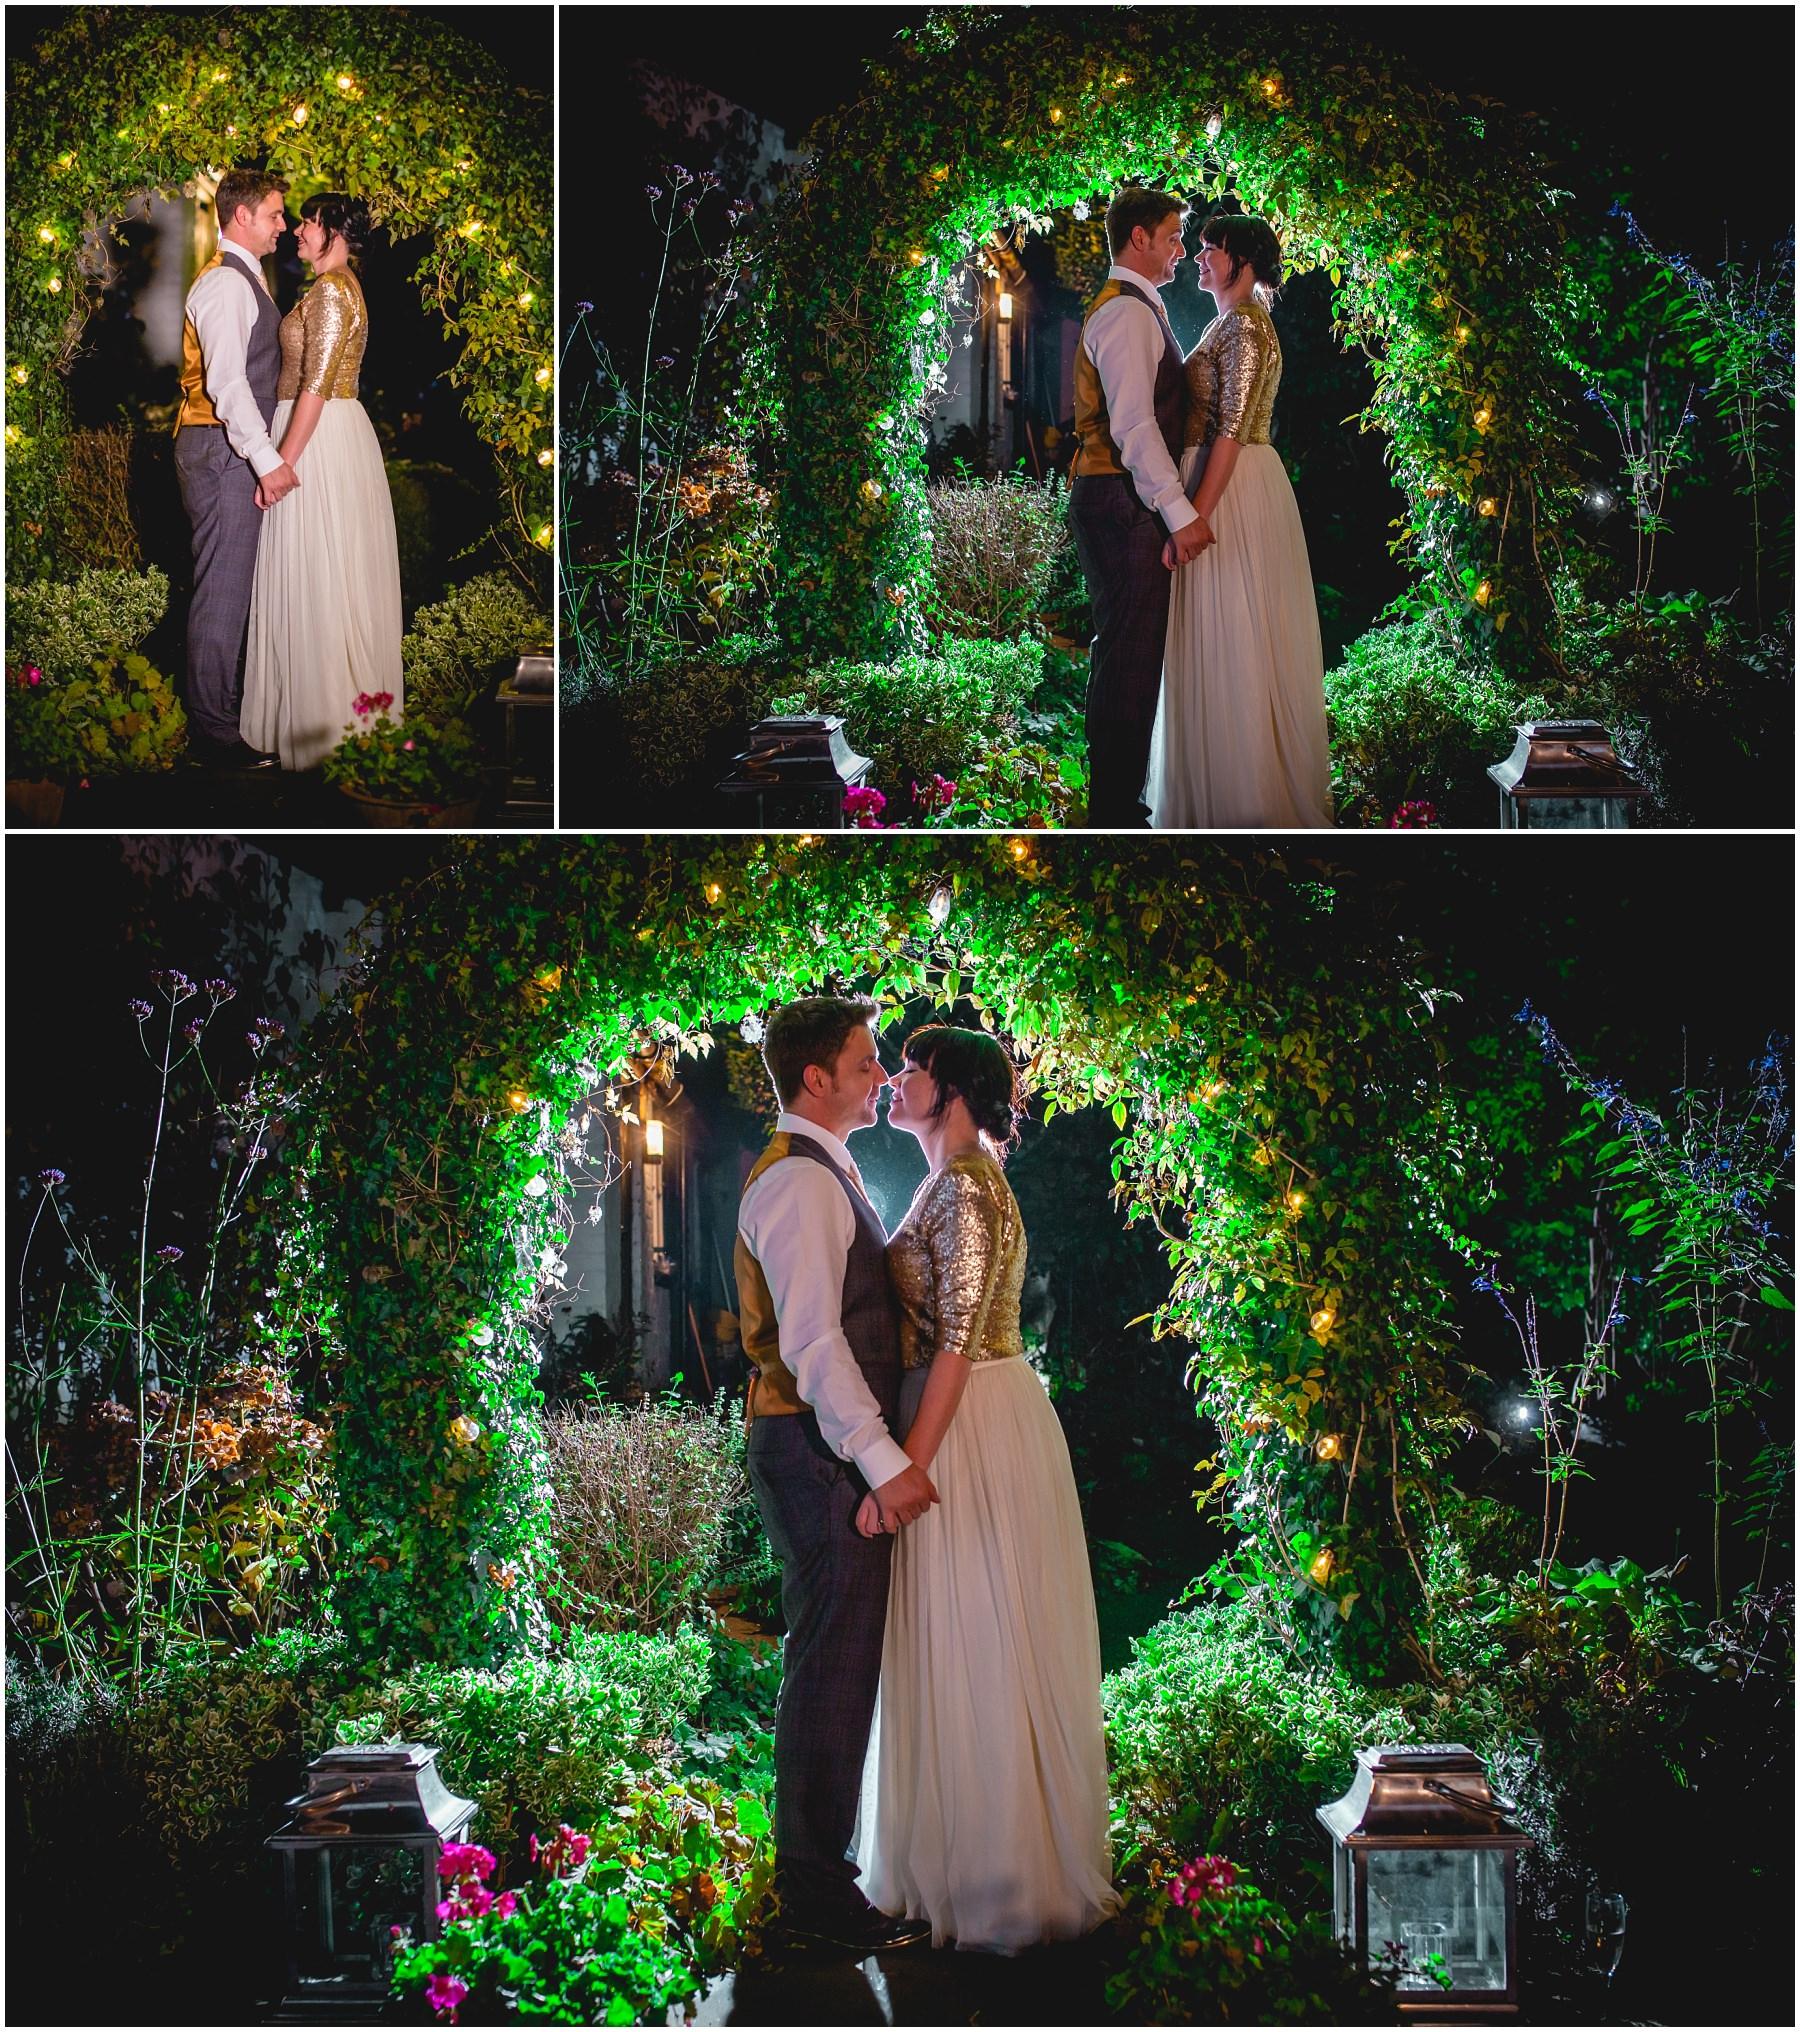 wedding photographs under the garden arch at the belle epoque